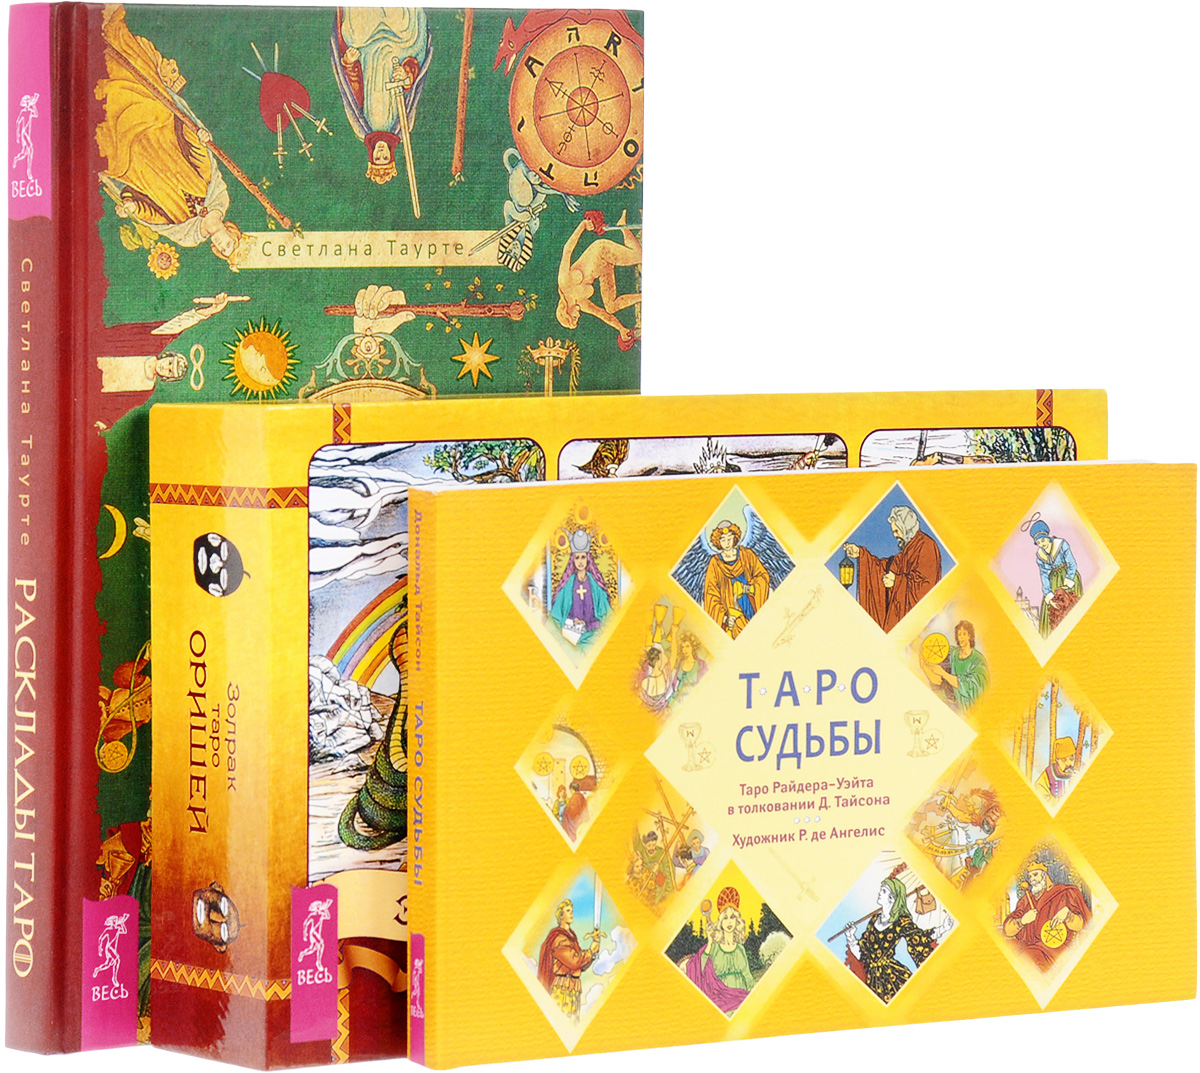 9785944394156 - Золрак,Дональд Тайсон,Светлана Таурте: Таро Оришей. Таро судьбы. Расклады Таро (комплект из 3 книг + 77 карт) - Книга